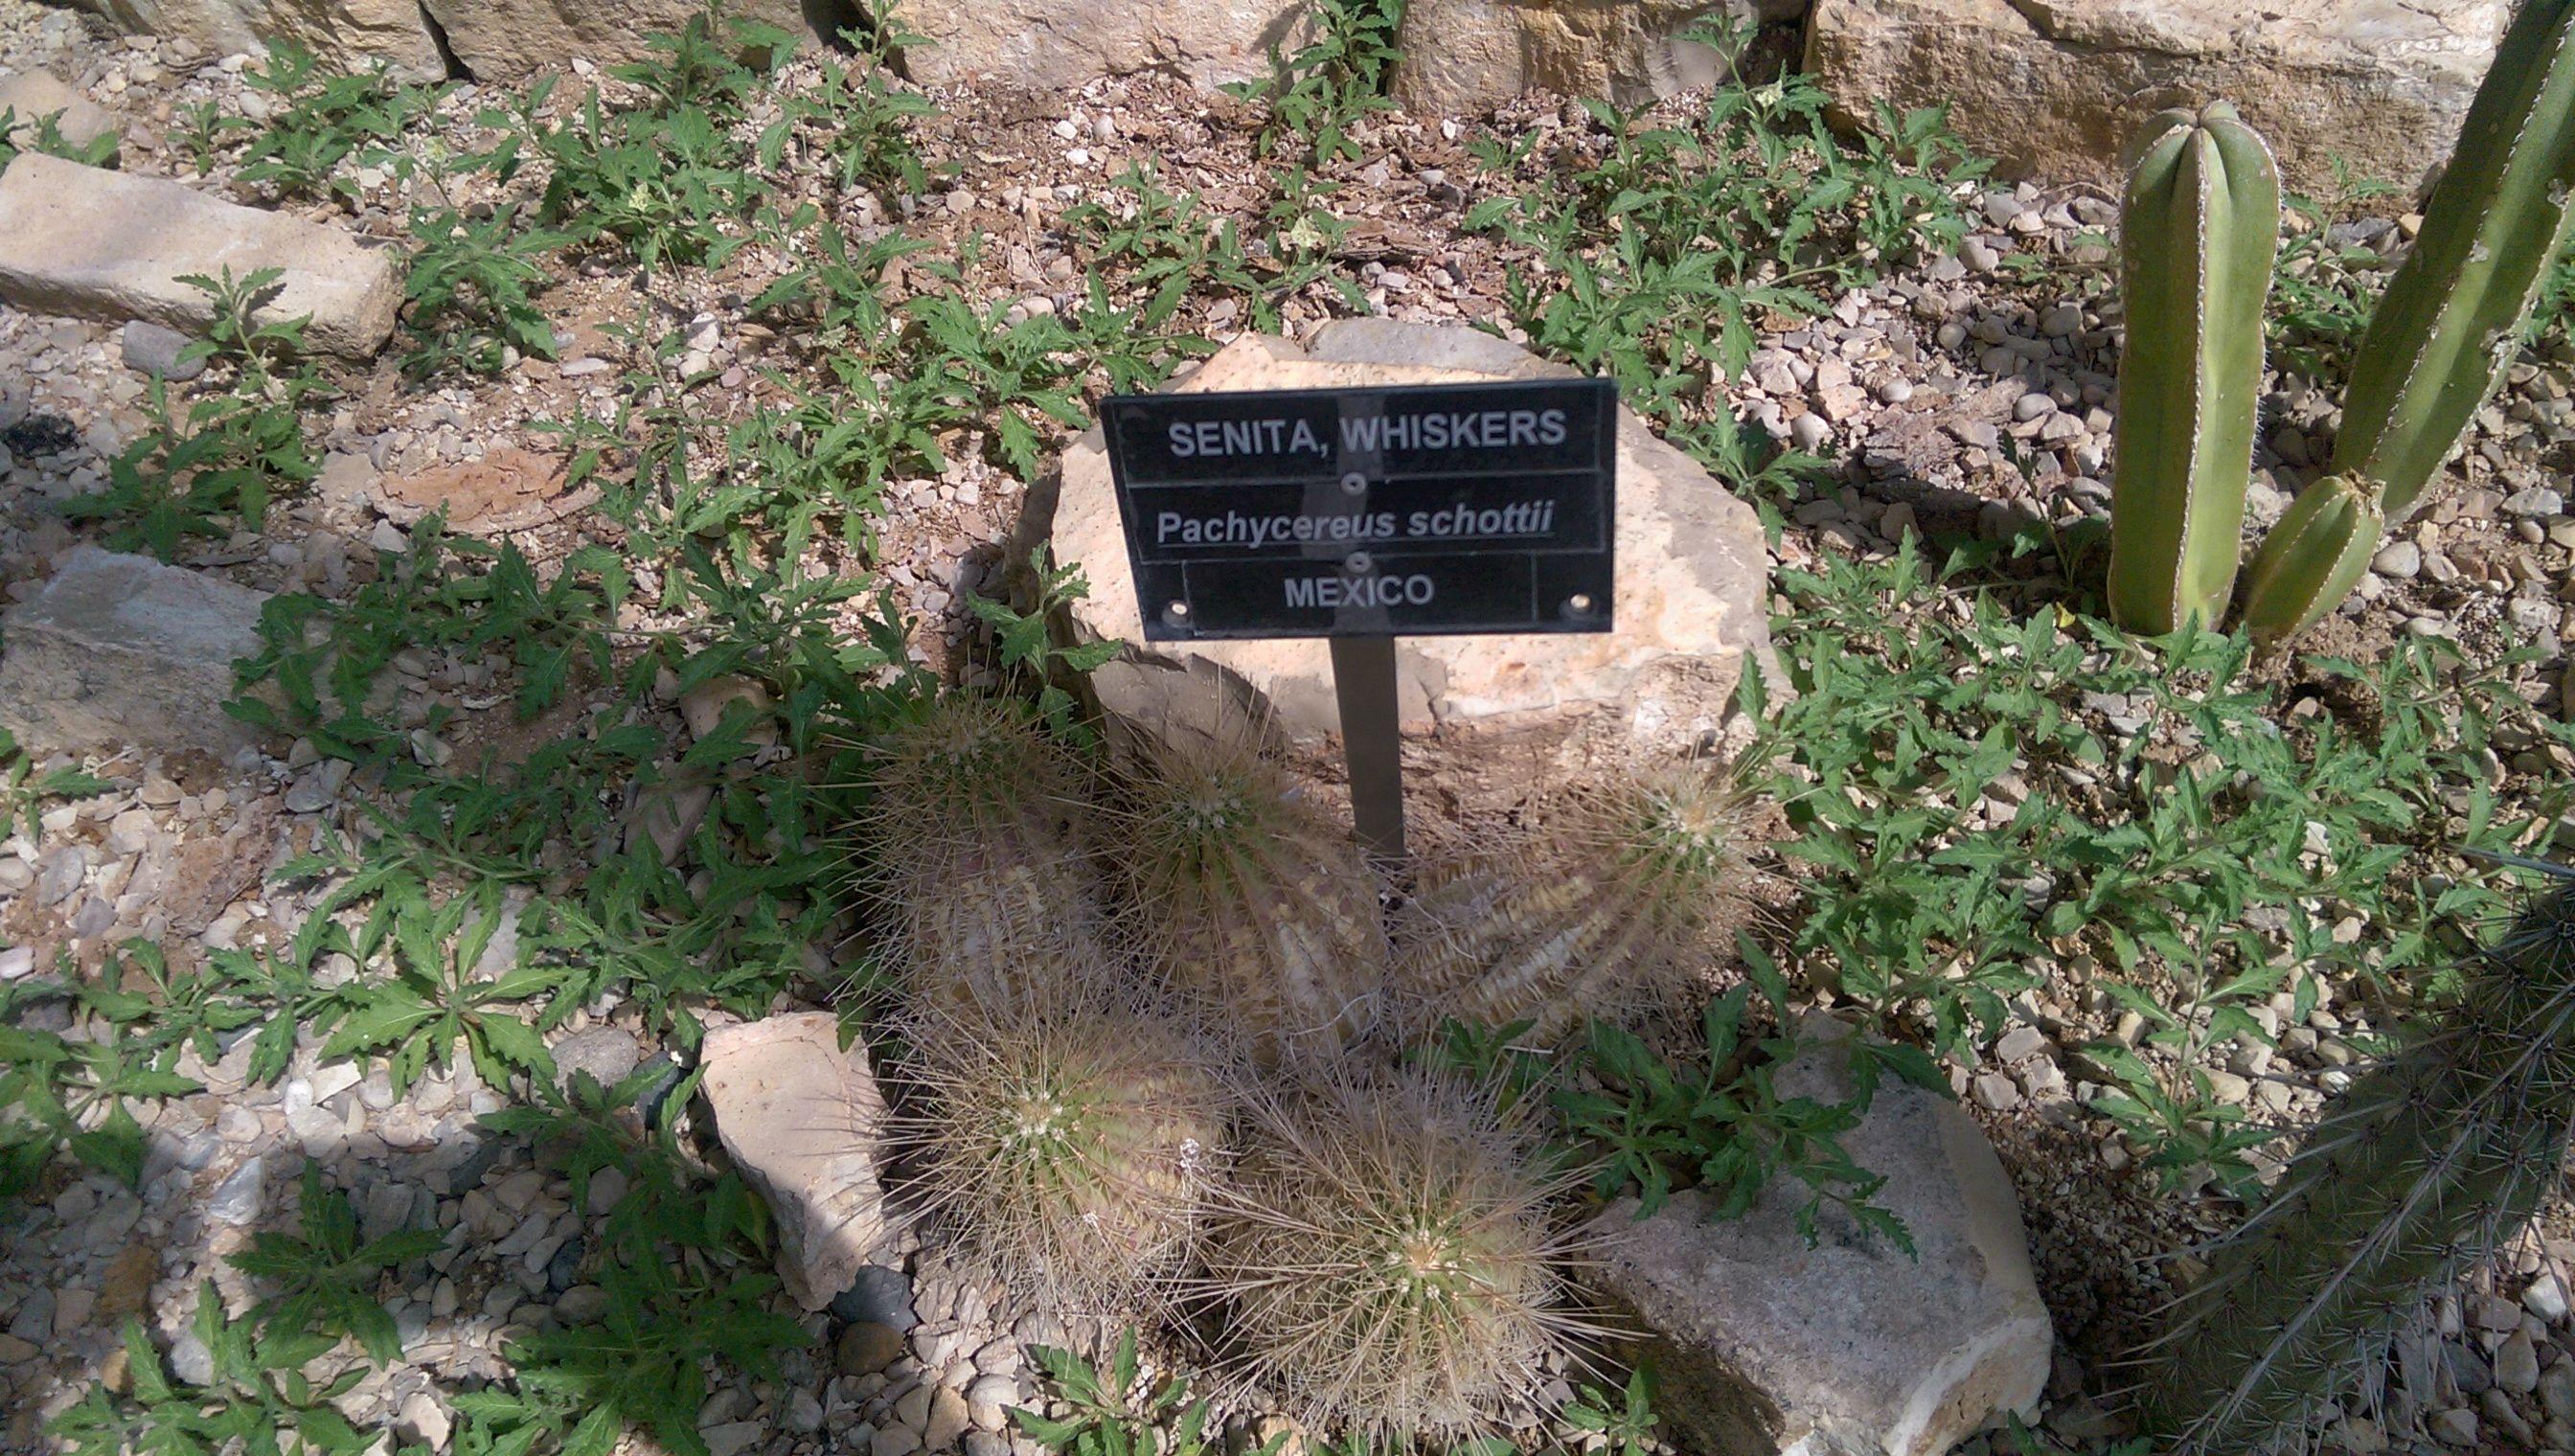 fea6780e67e22a702f15a73af8d39b50 - Living Desert Zoo And Gardens Carlsbad Nm